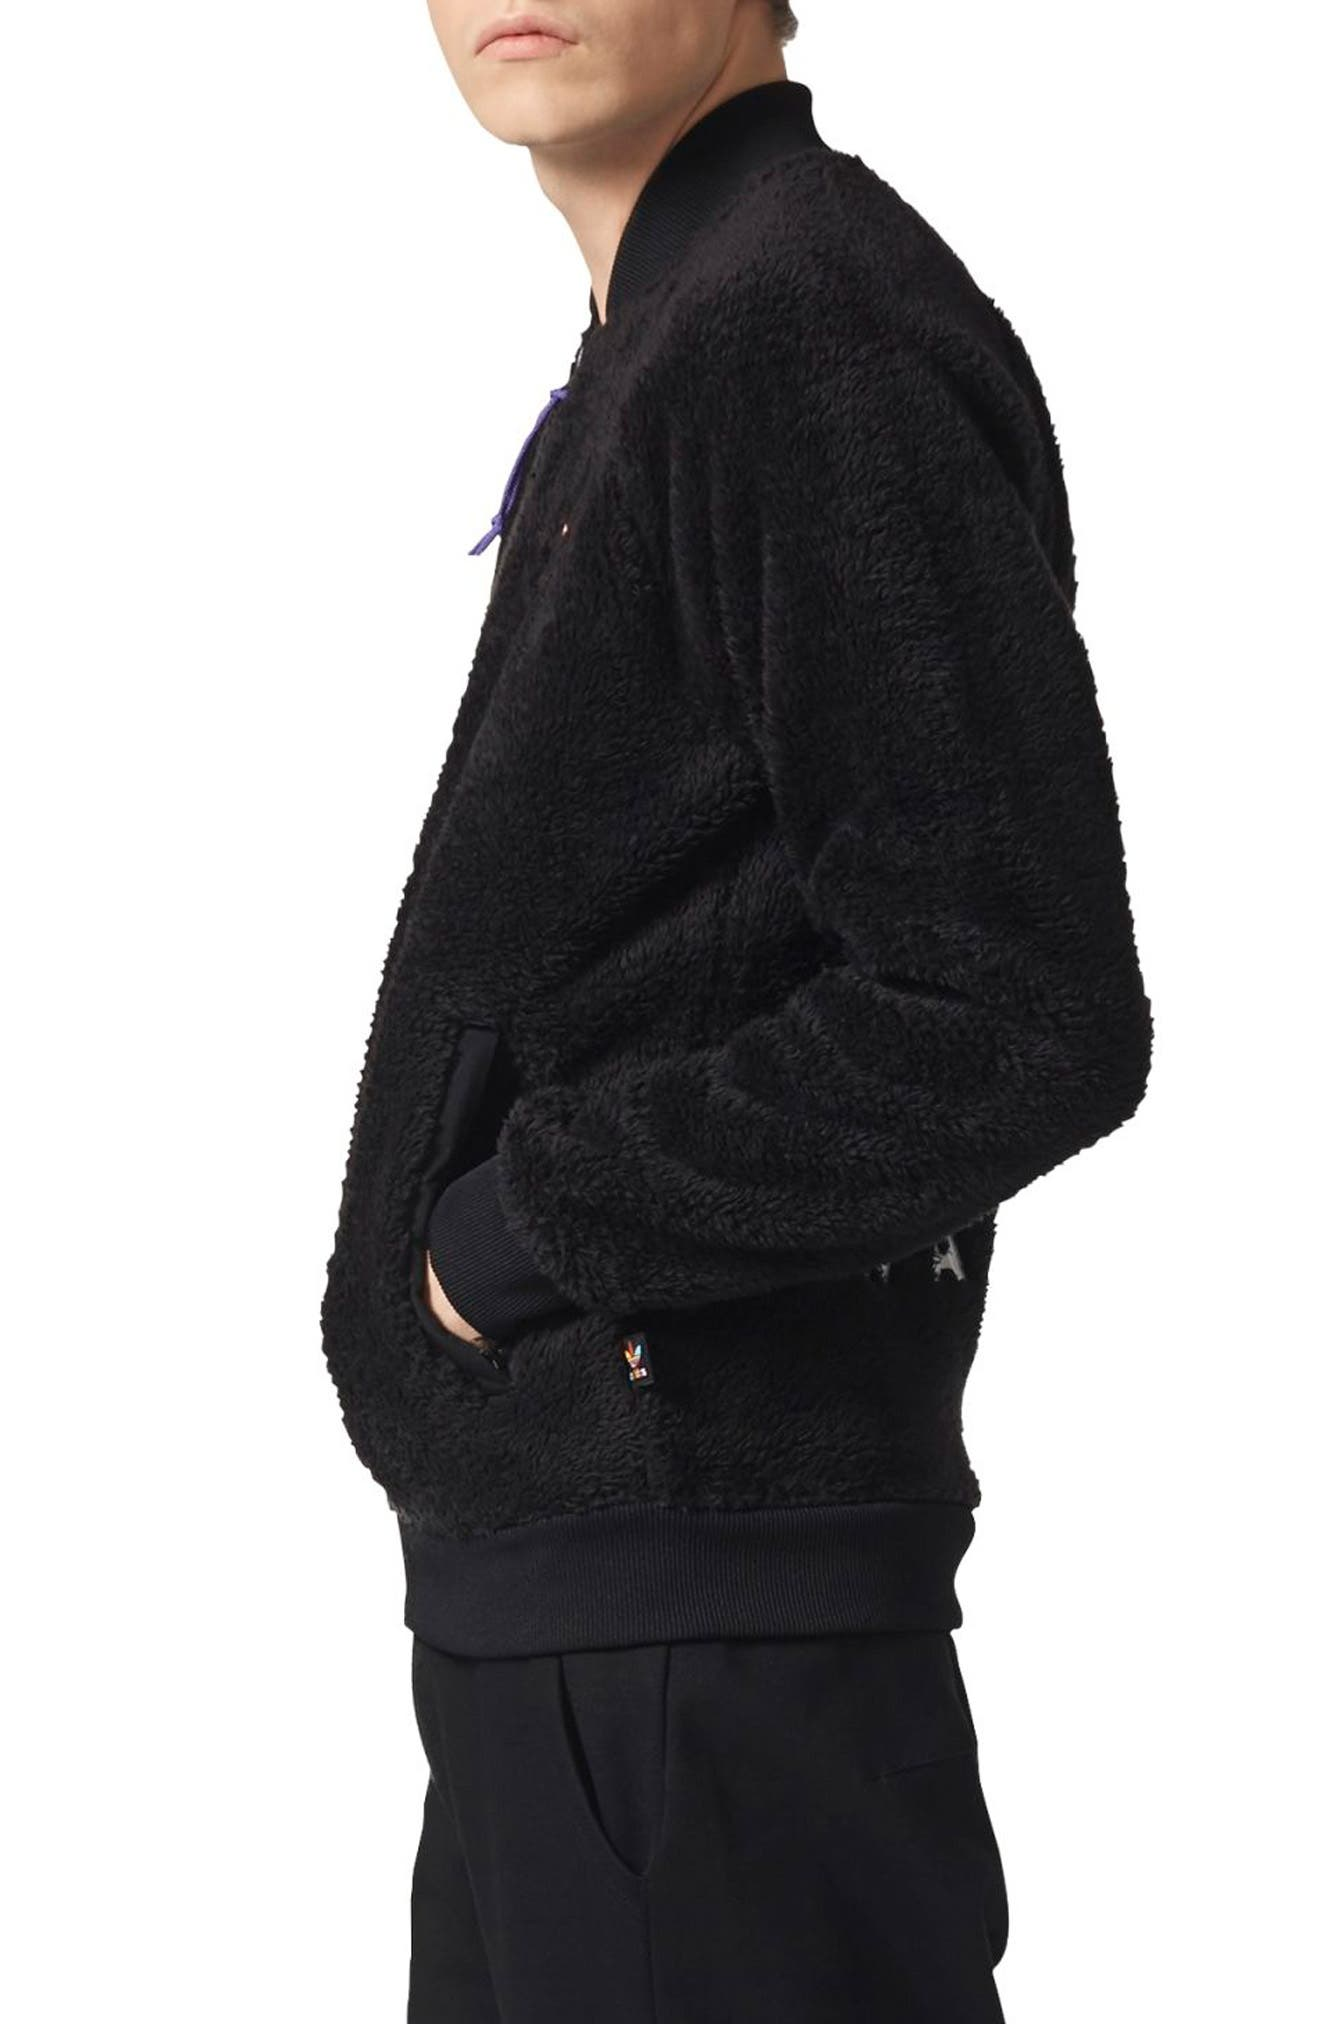 Originals Pharrell Williams Hu Hiking Fleece Track Jacket,                             Alternate thumbnail 3, color,                             Black